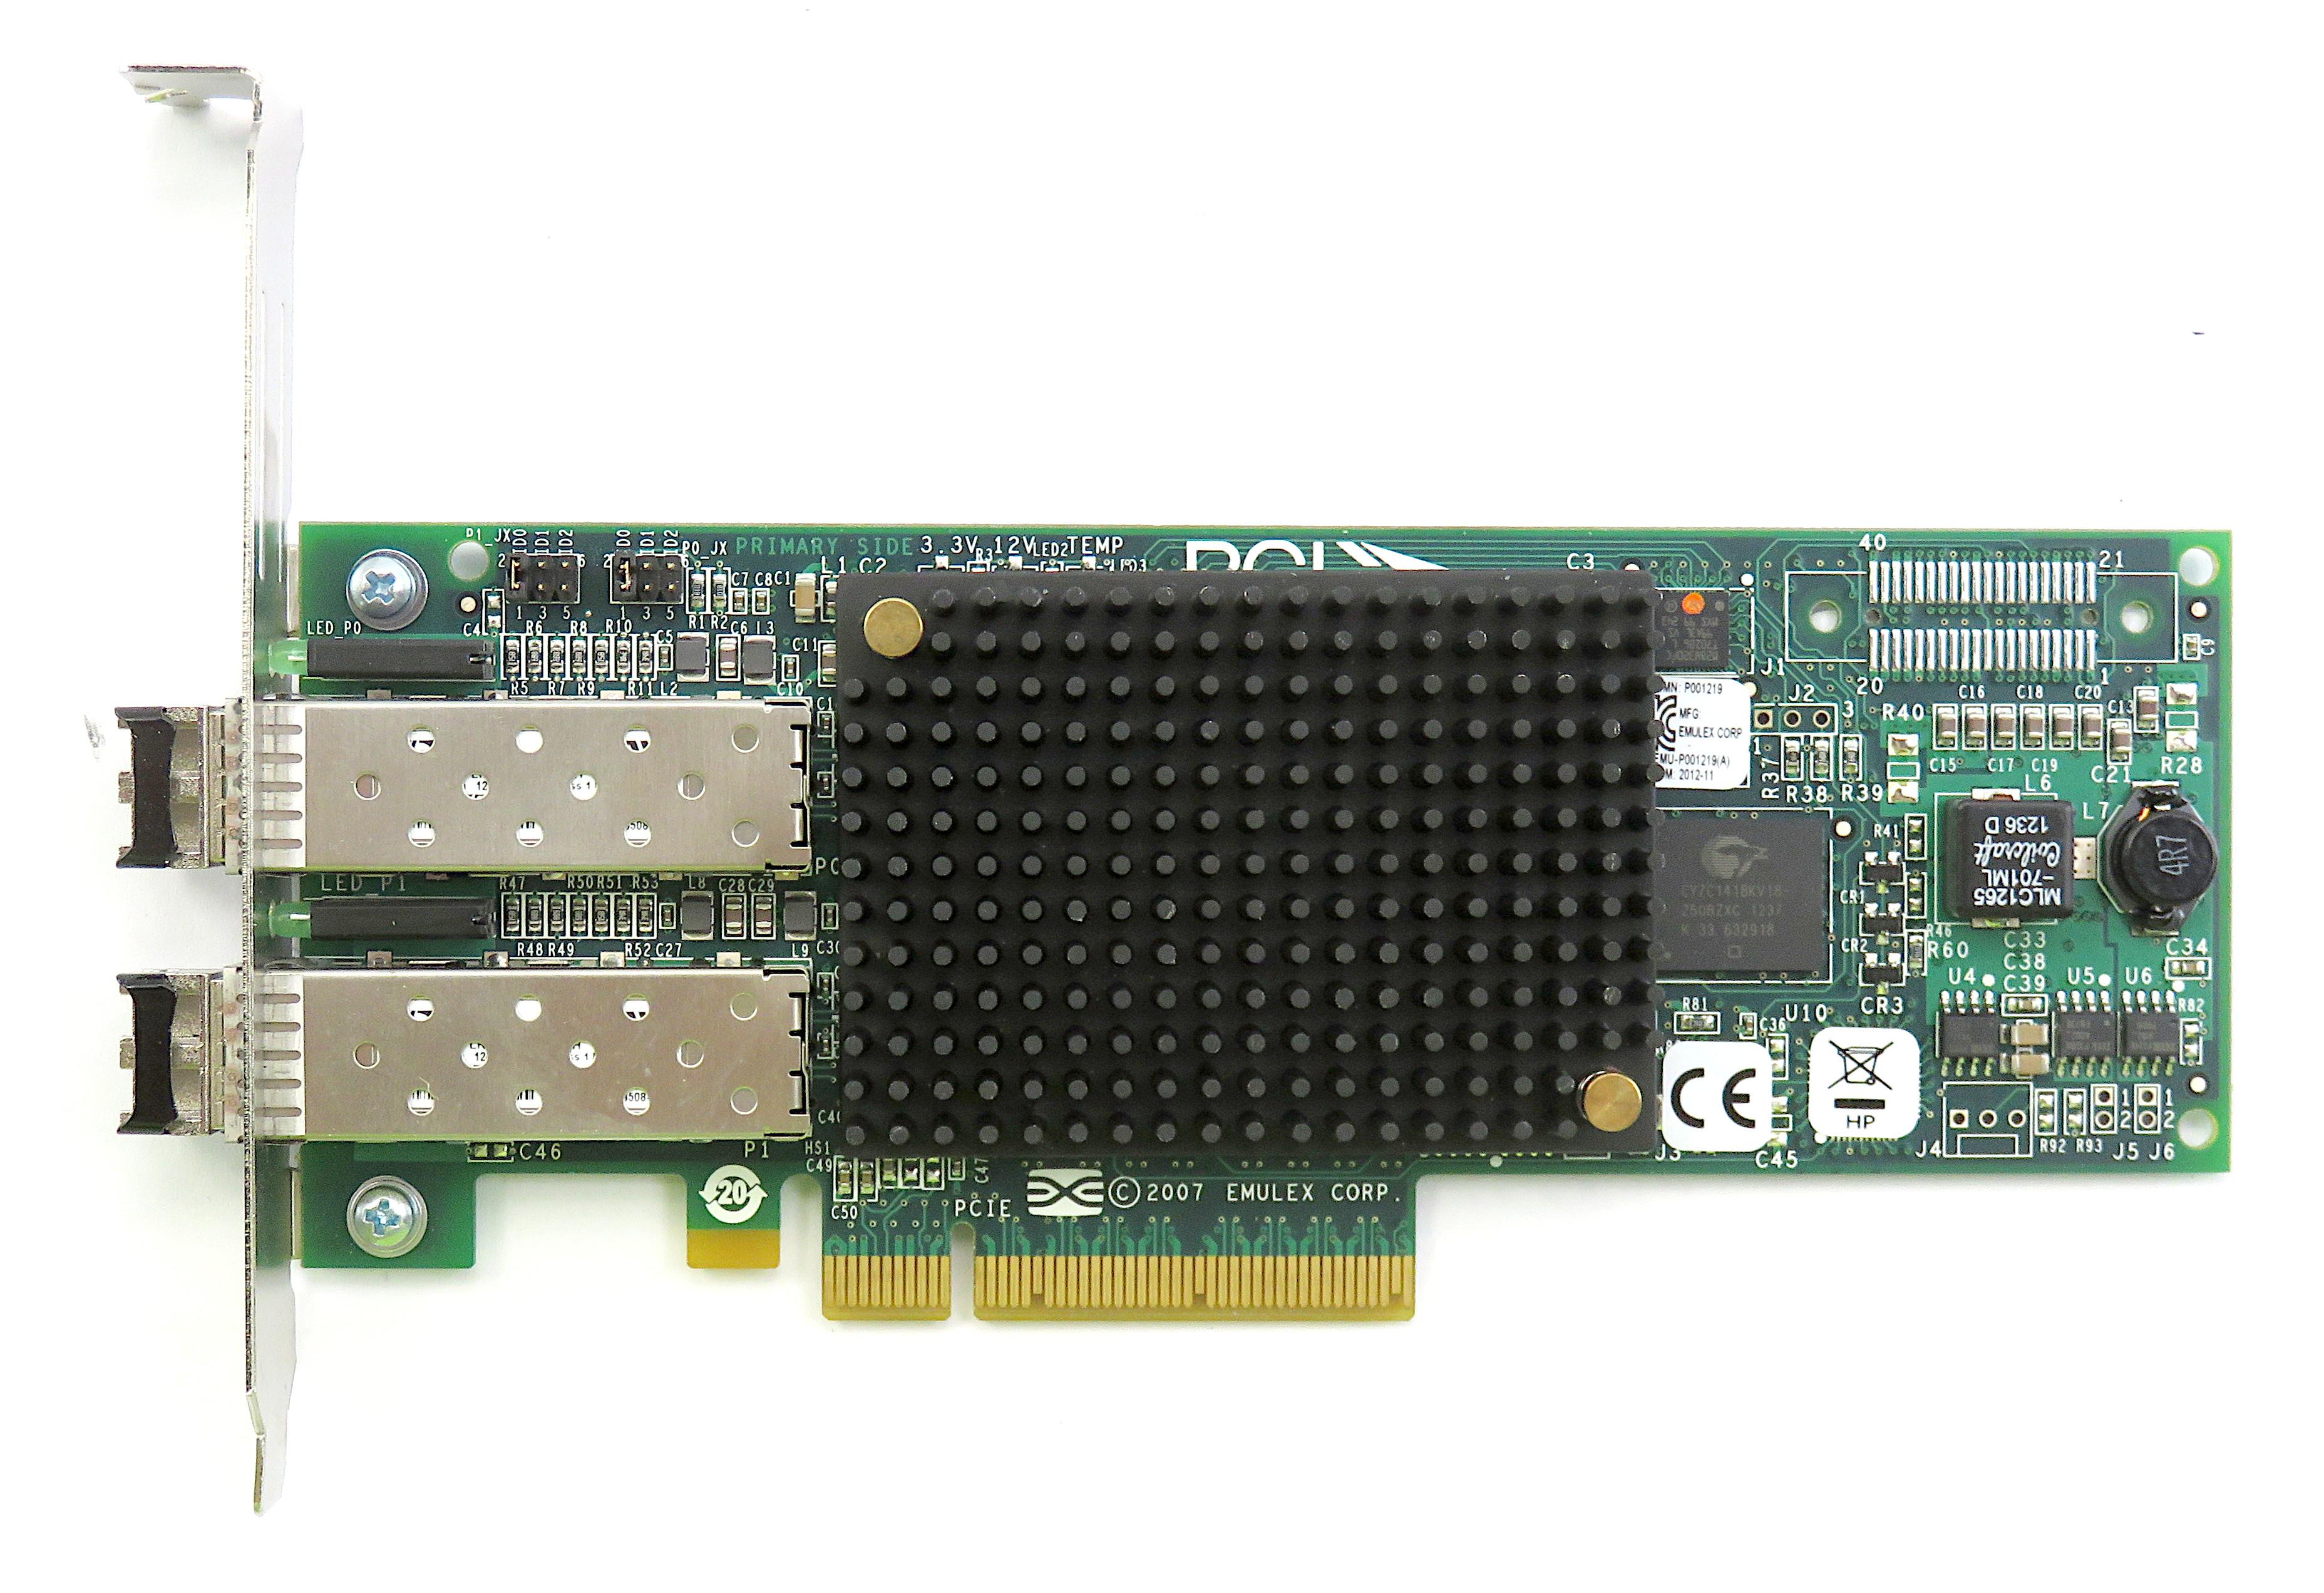 HP AJ763-63003 Emulex LPE12002 8Gb Dual-Port HBA with 2x AJ718A Transceivers